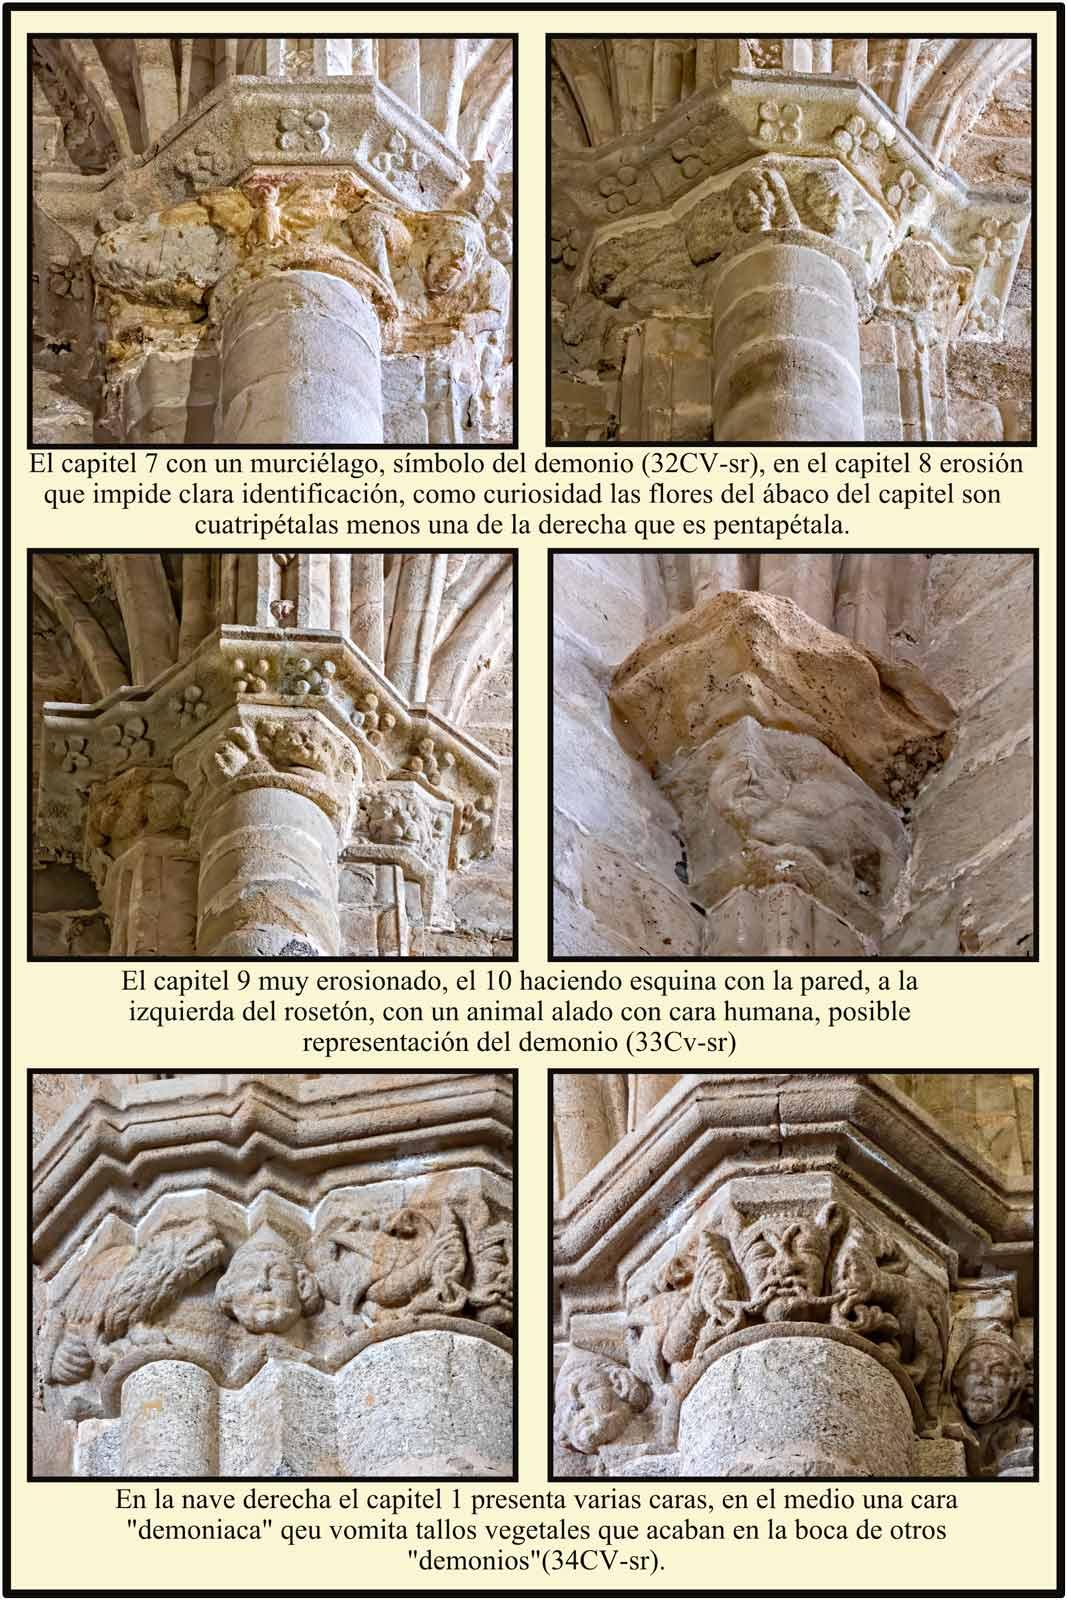 capiteles romanicos catedral vieja murcielago simbolo demonio cara vomito vegetal